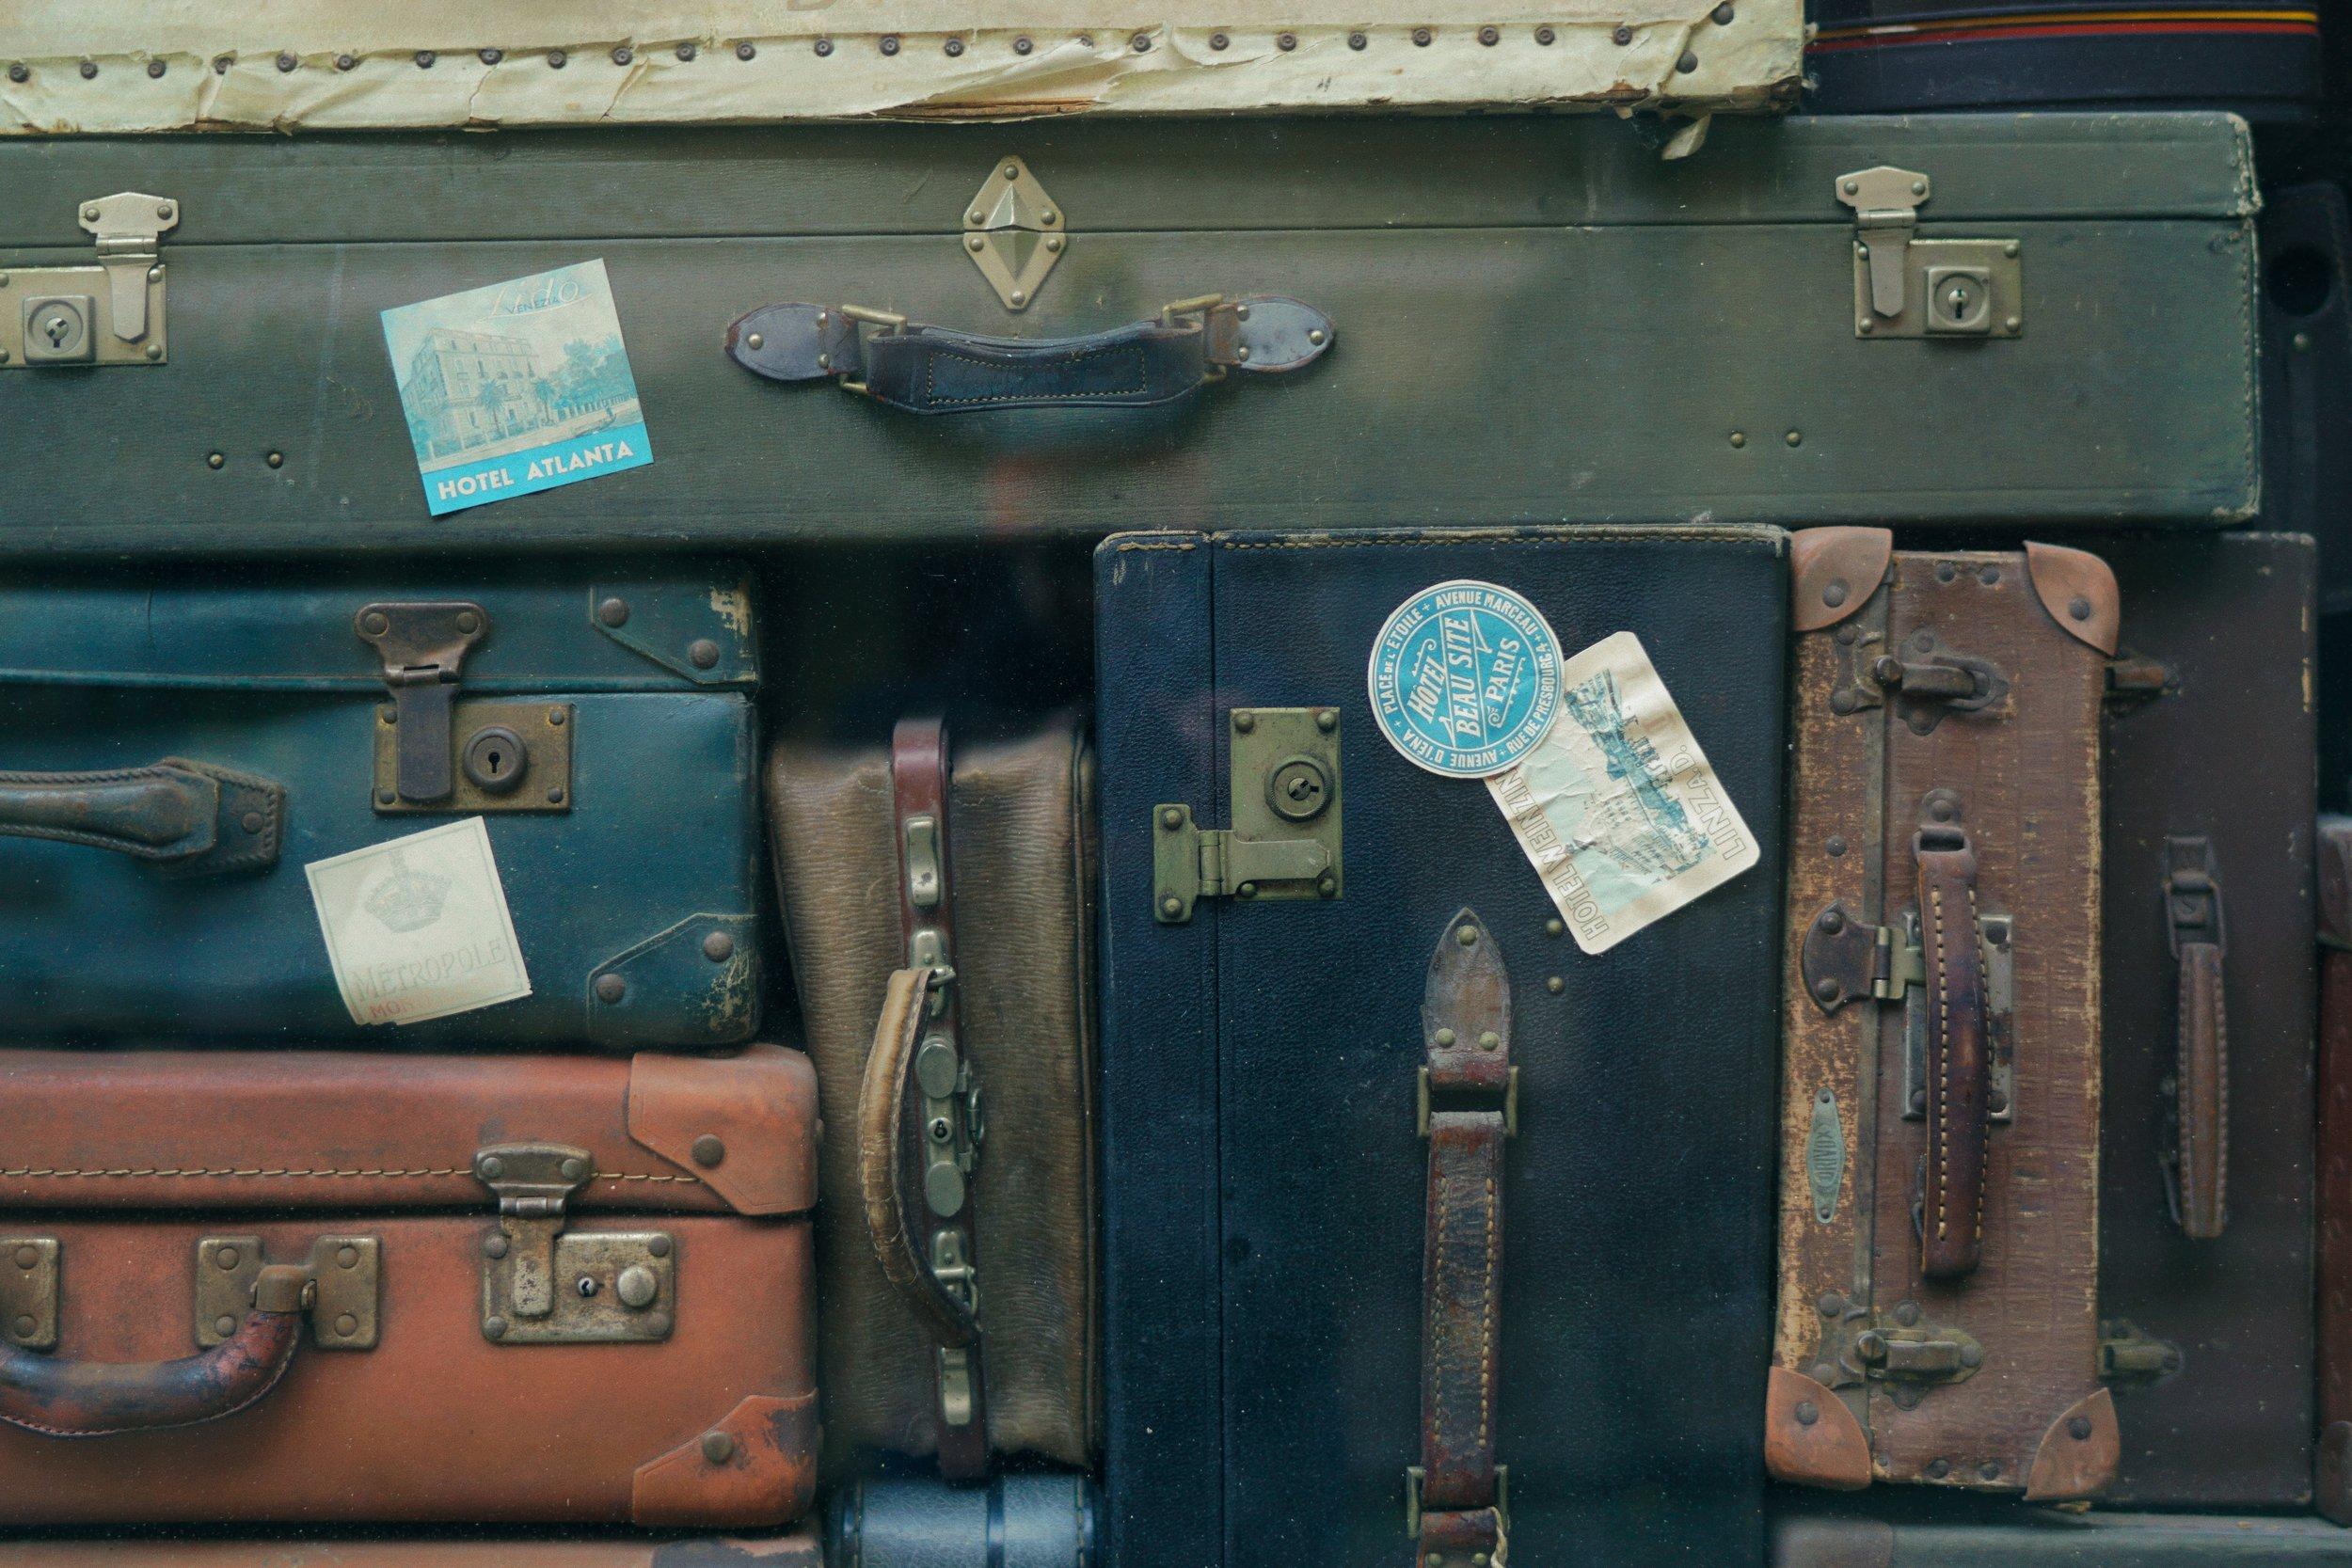 lodging & travel -